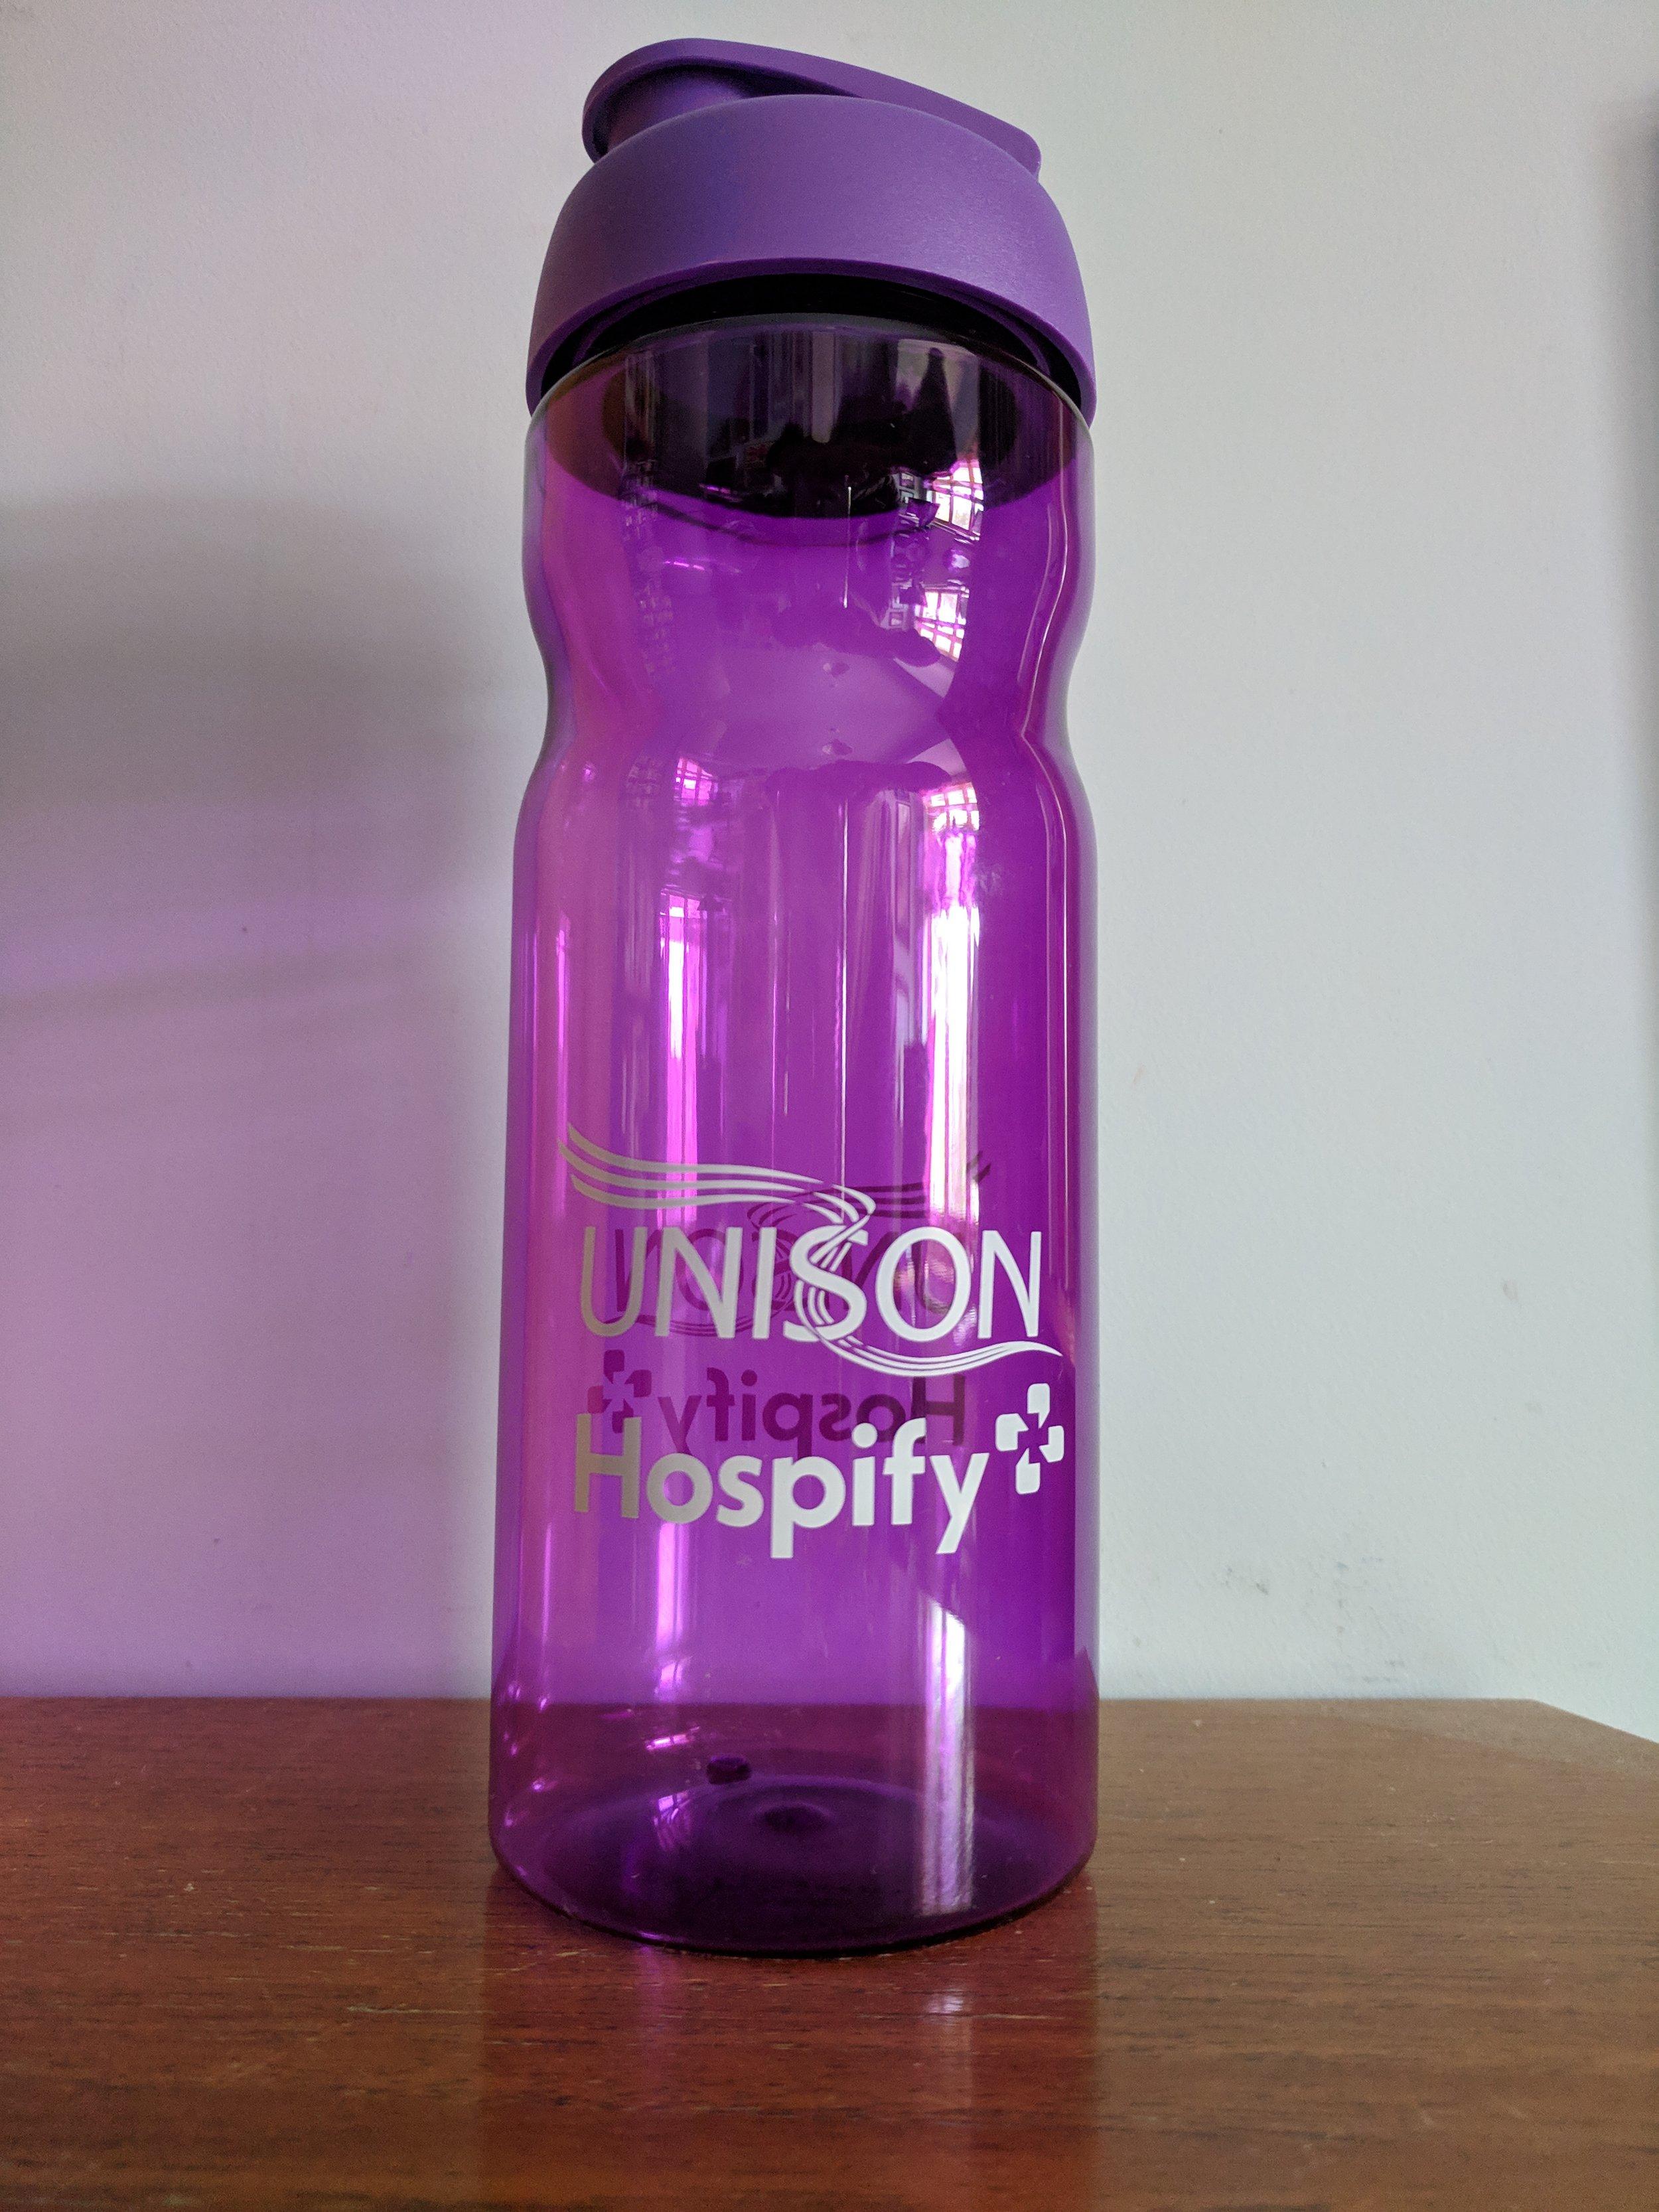 Unison water bottle 2.jpg